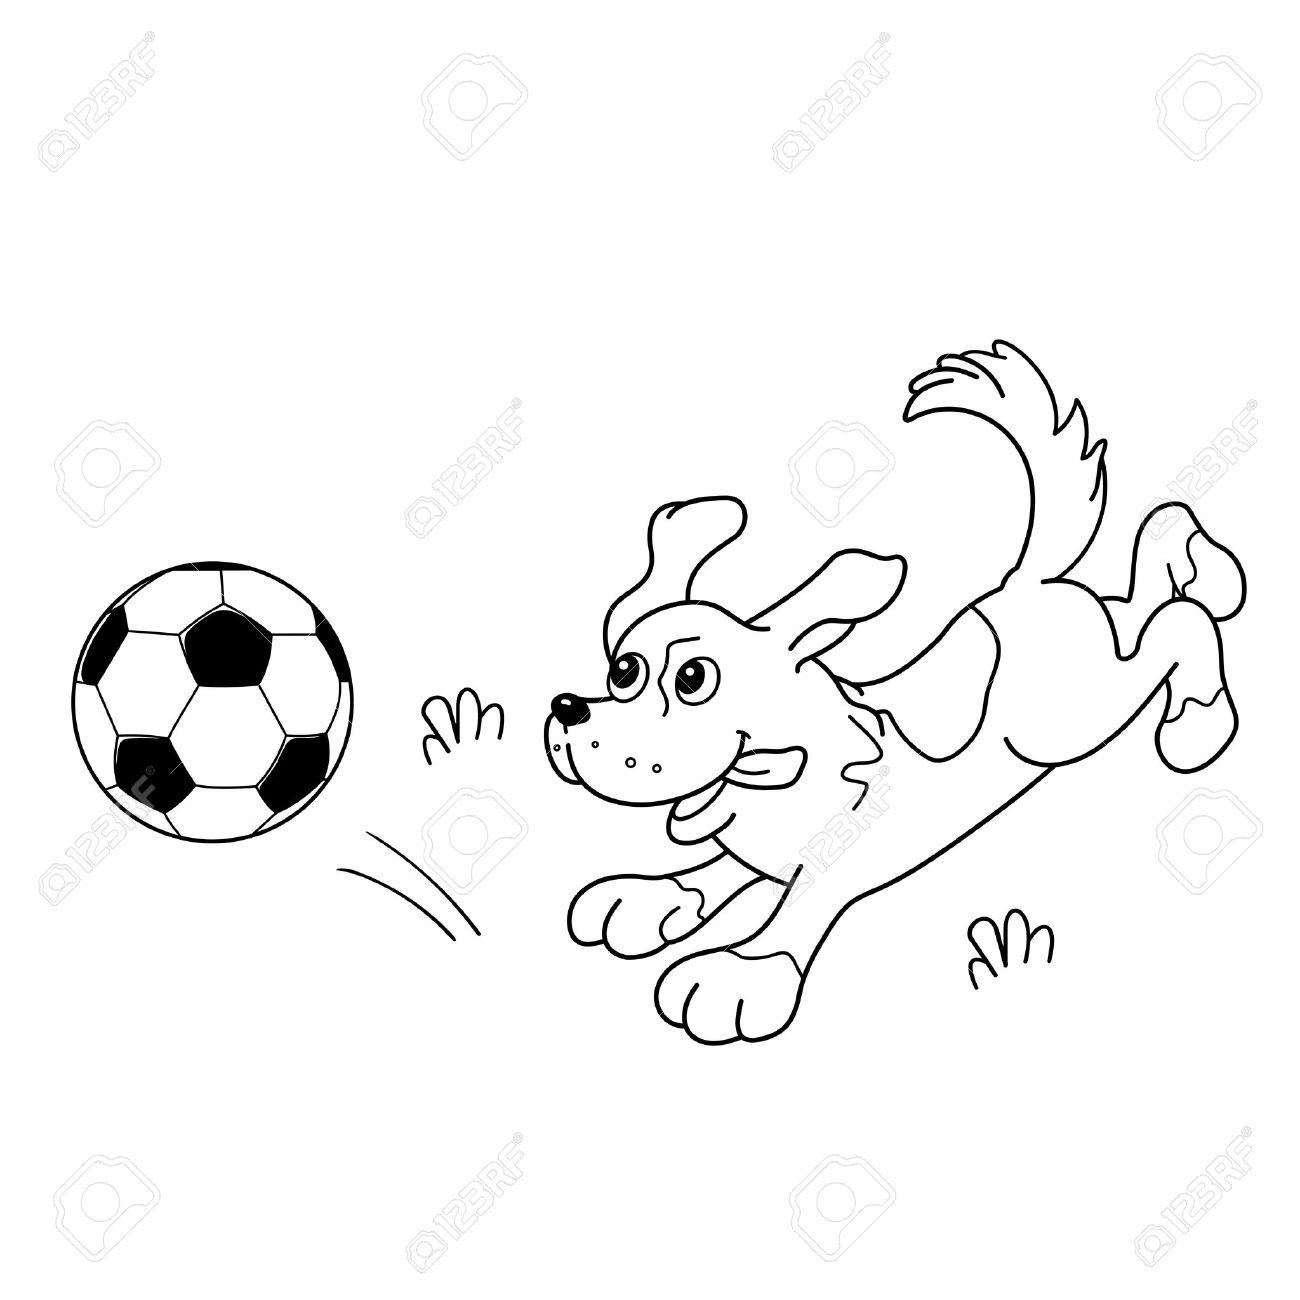 Ballon Pour Coloriage.Coloriage Outline De Chien De Dessin Anime Avec Ballon De Soccer